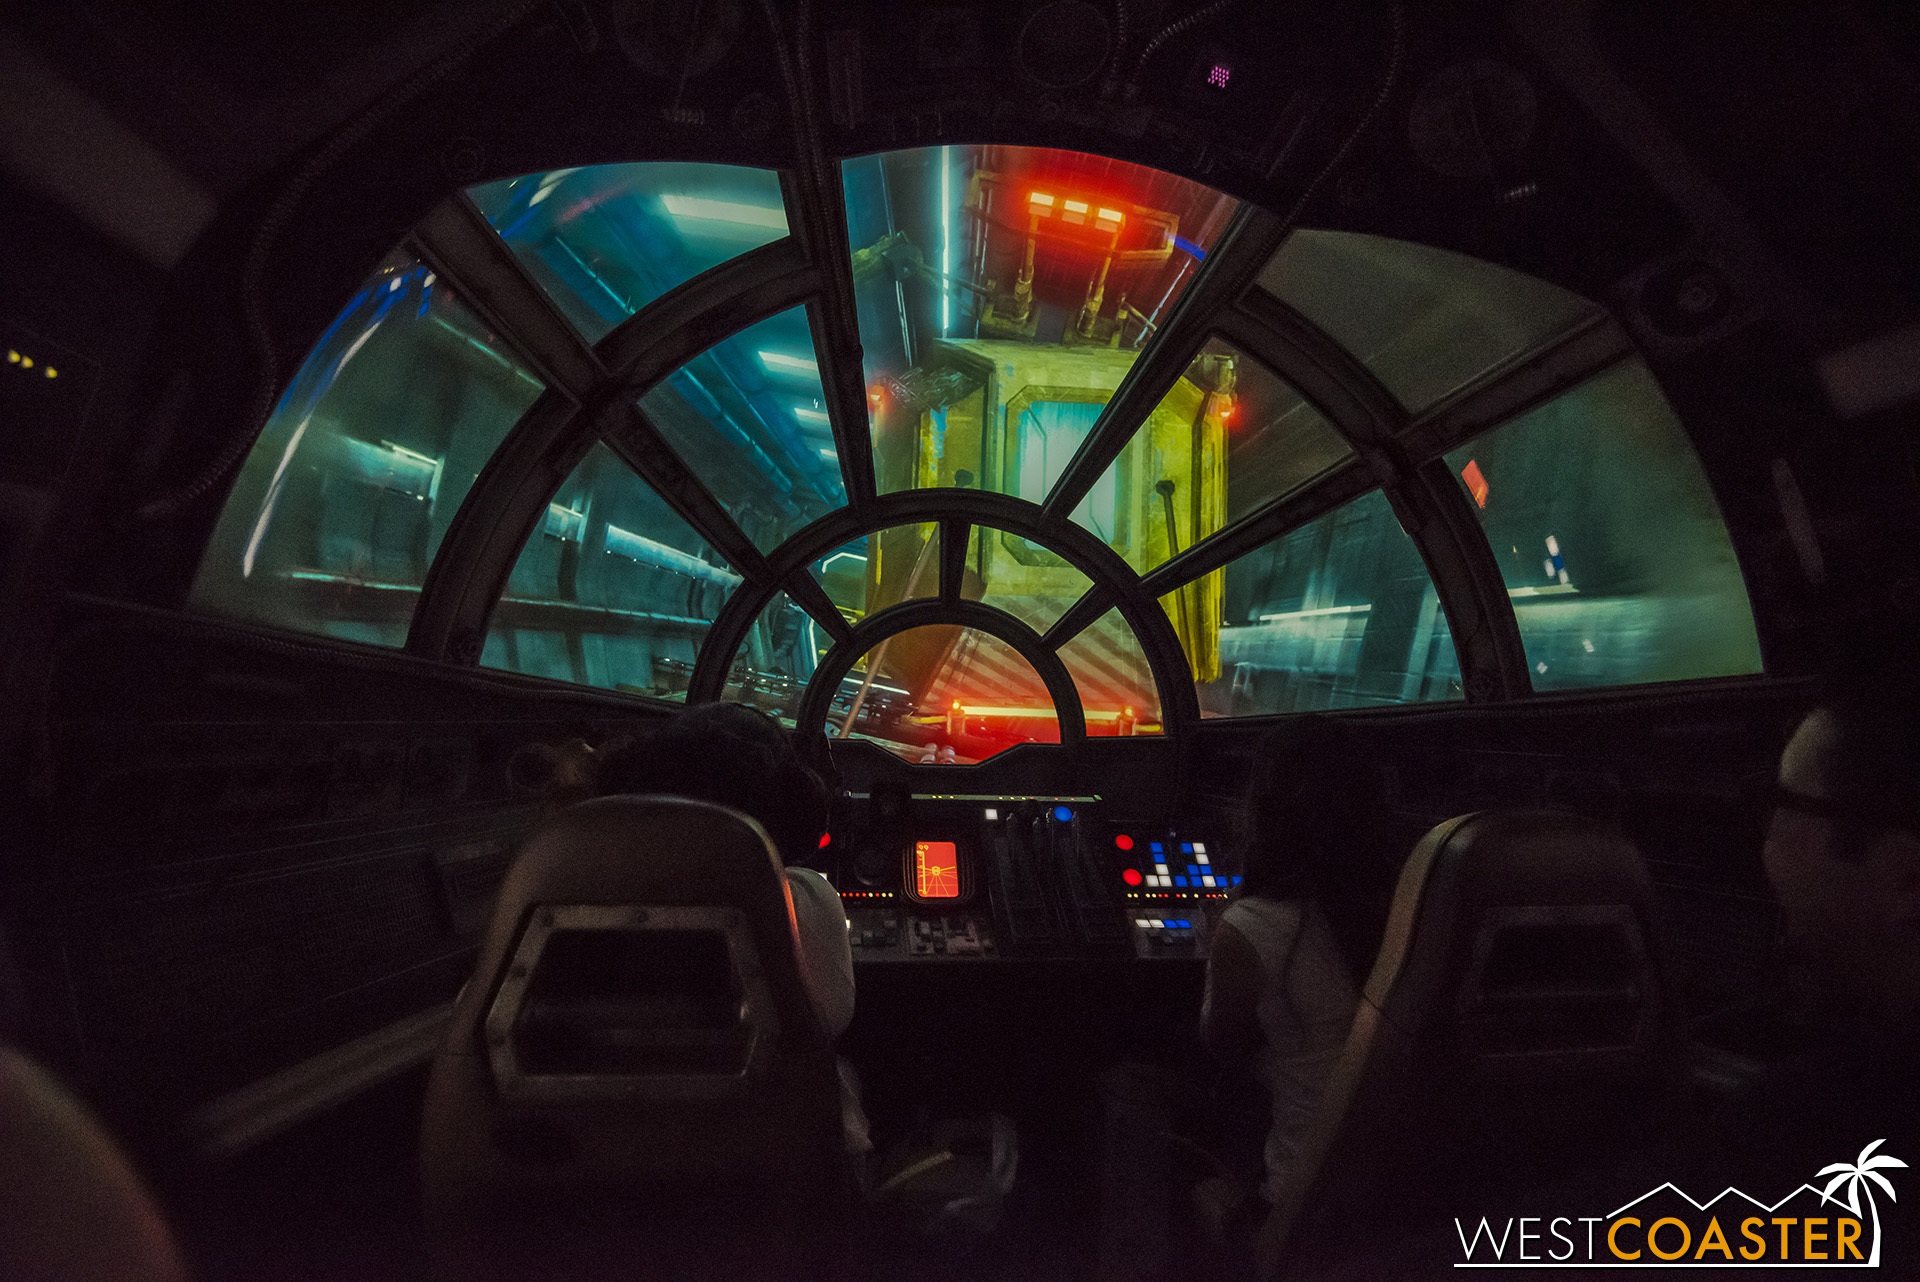 DLR-19_0606-D-Cockpit-0007.jpg